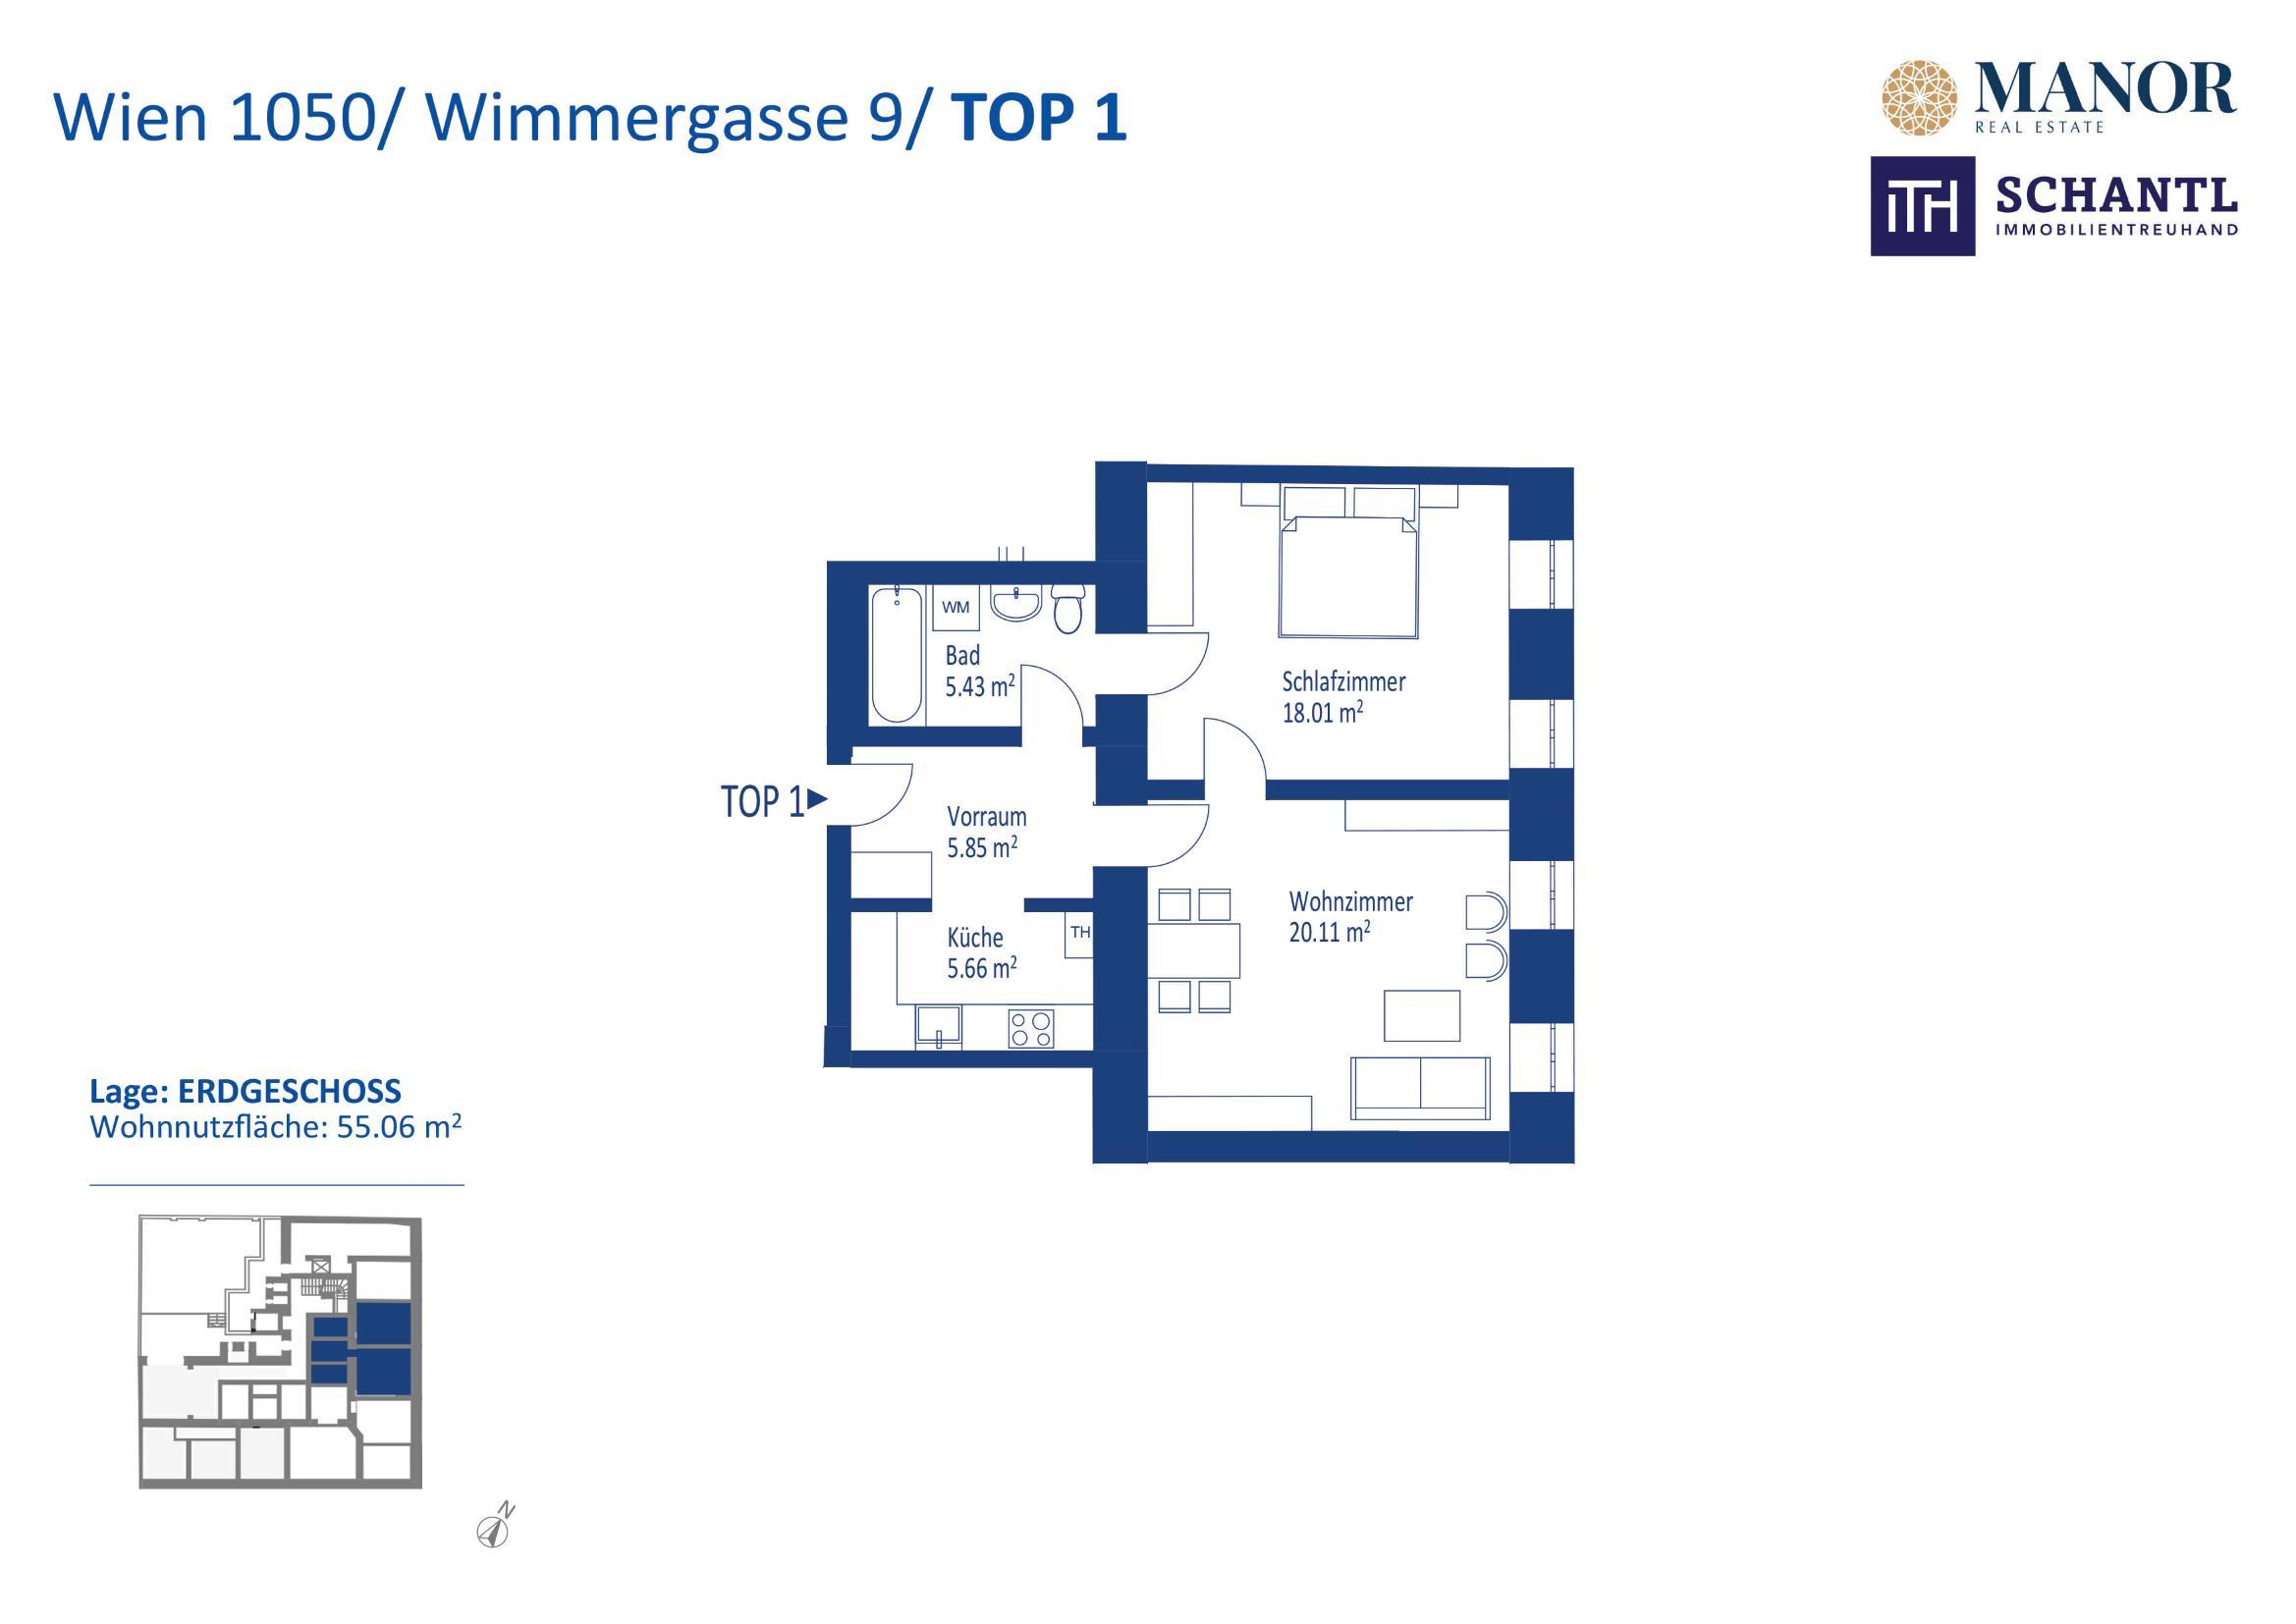 Wien 1050_Wimmergasse 9_TOP 1